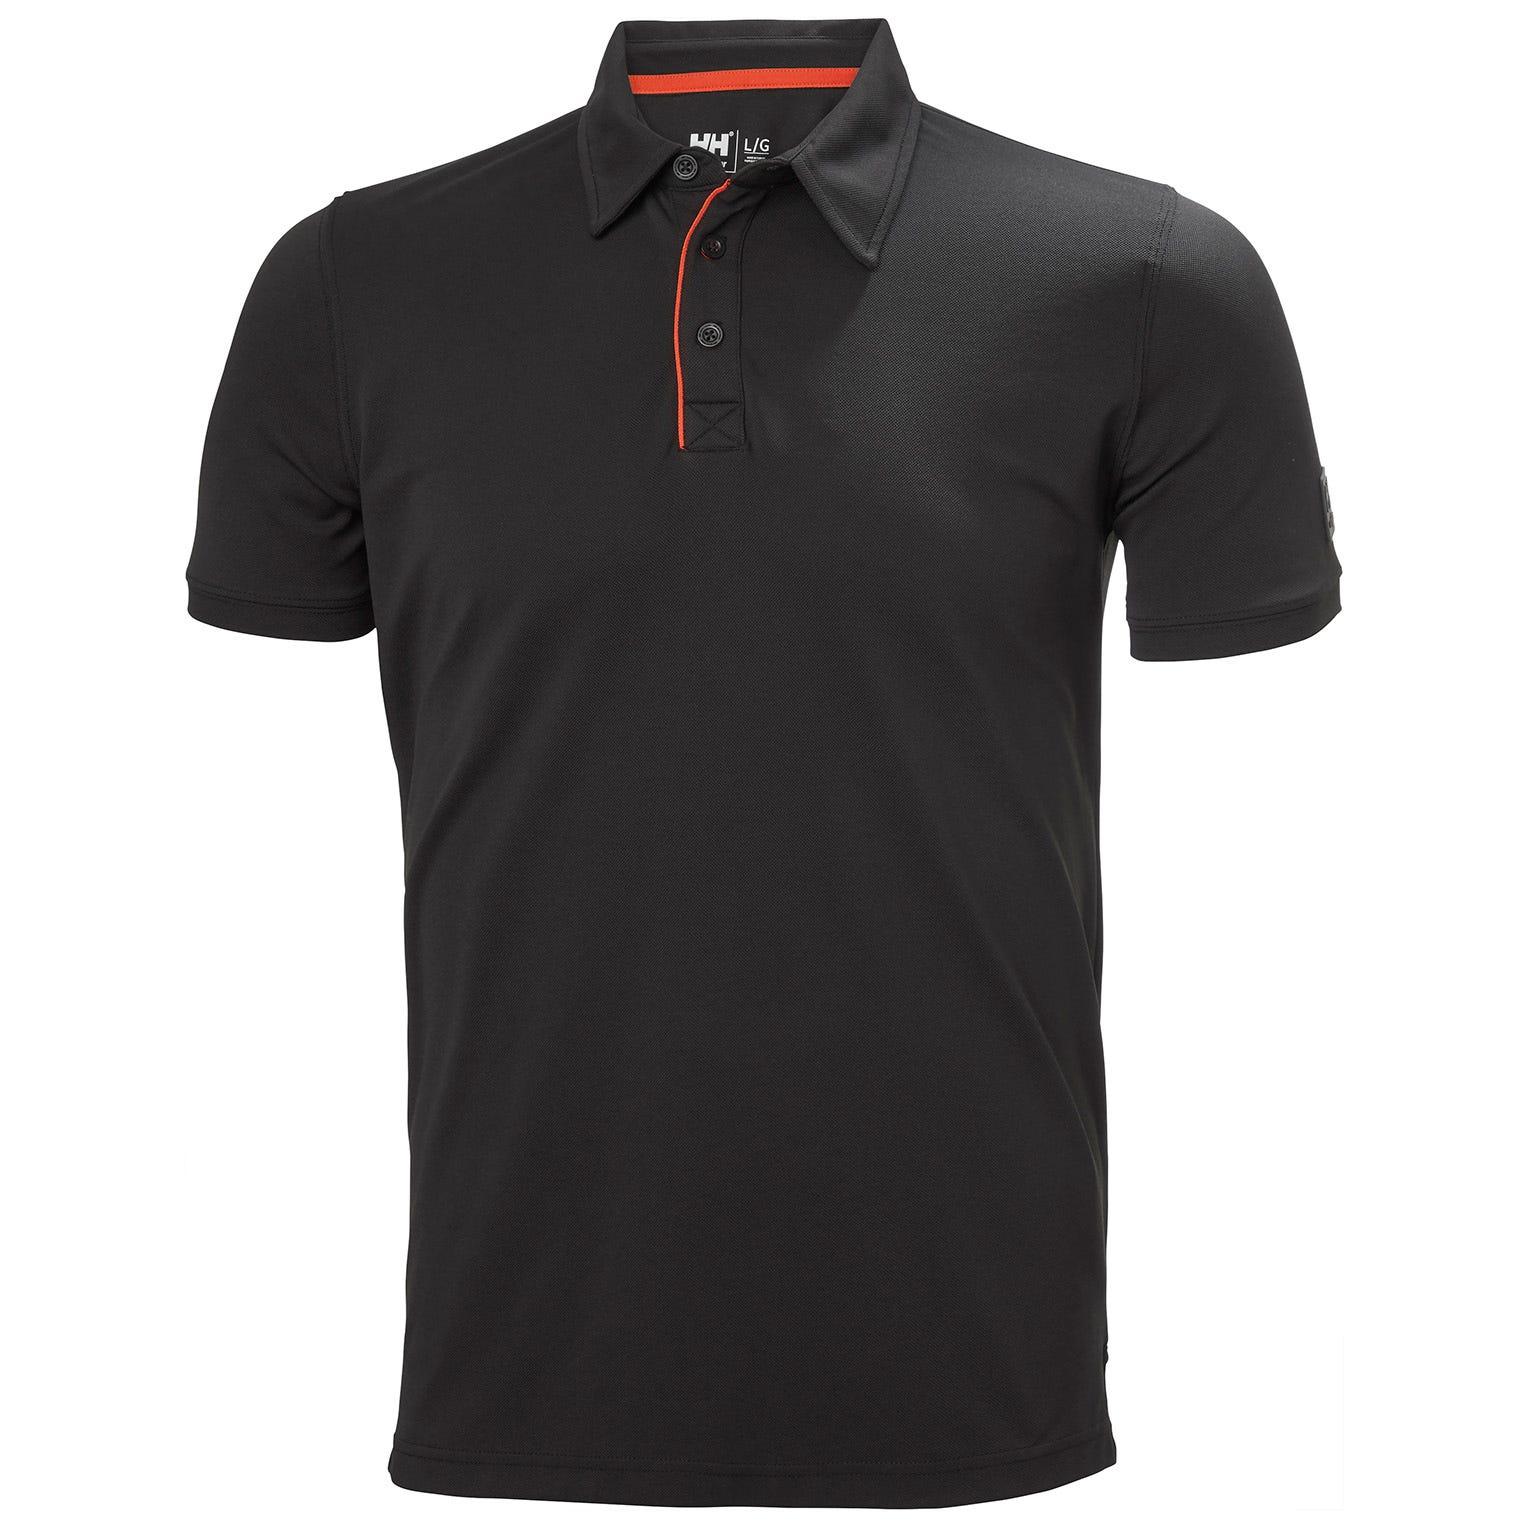 HH Workwear Workwear Kensington Tech Polo XL